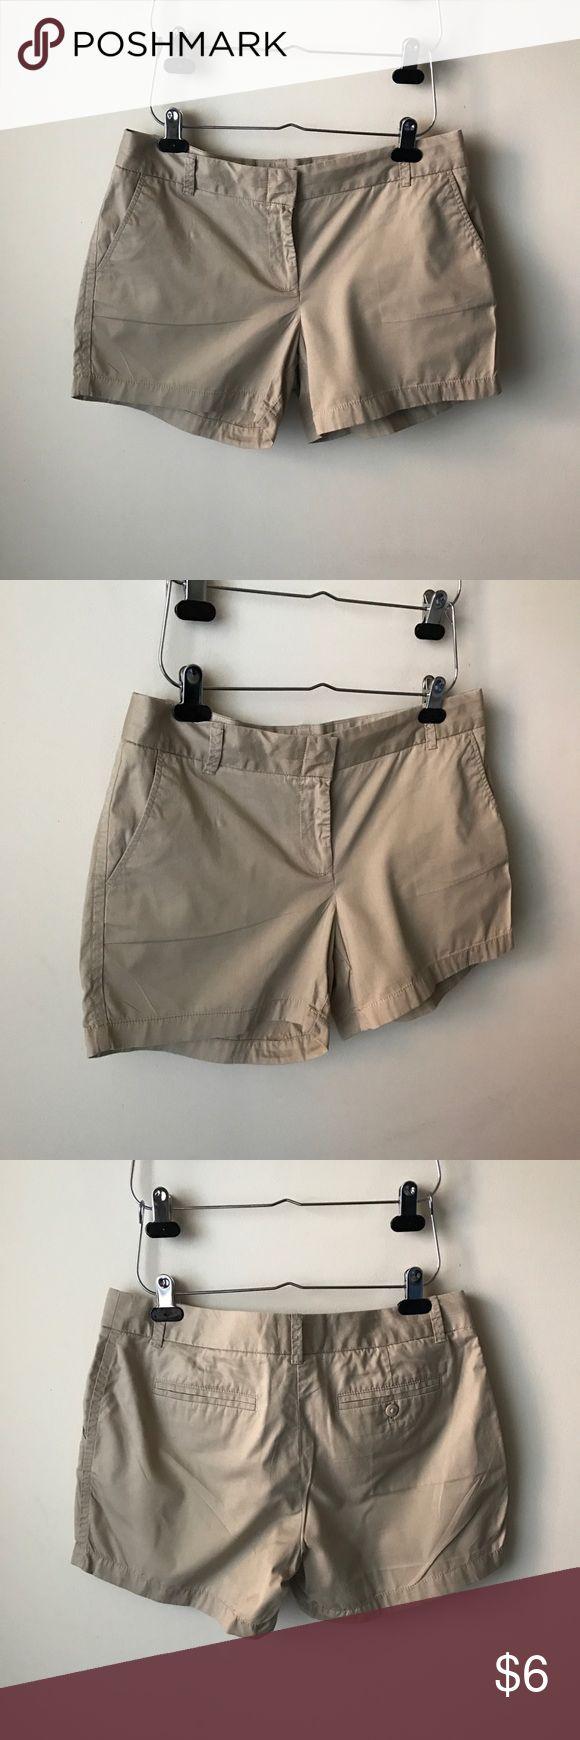 J. Crew Factory tan chino shorts Broken in chino style shorts - pockets - cotton - size 10 J. Crew Factory Shorts